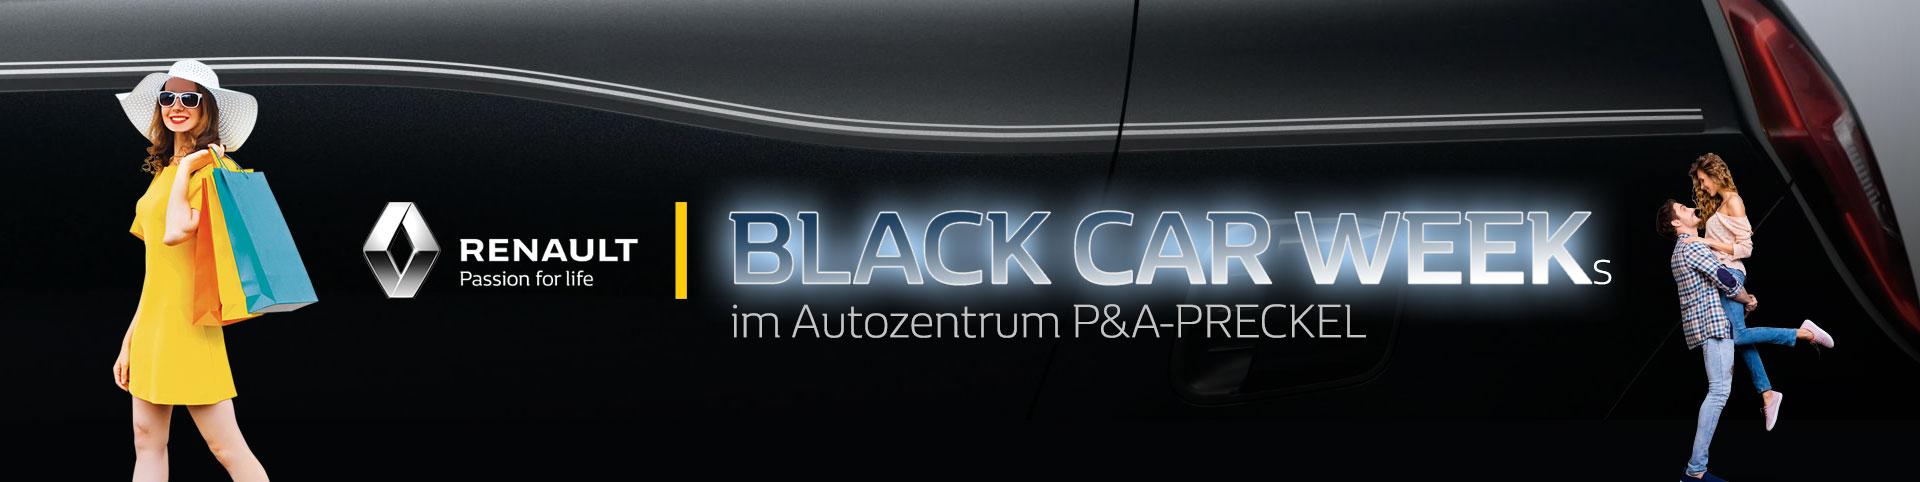 Black Car Weeks im Autozentrum P&A-Preckel